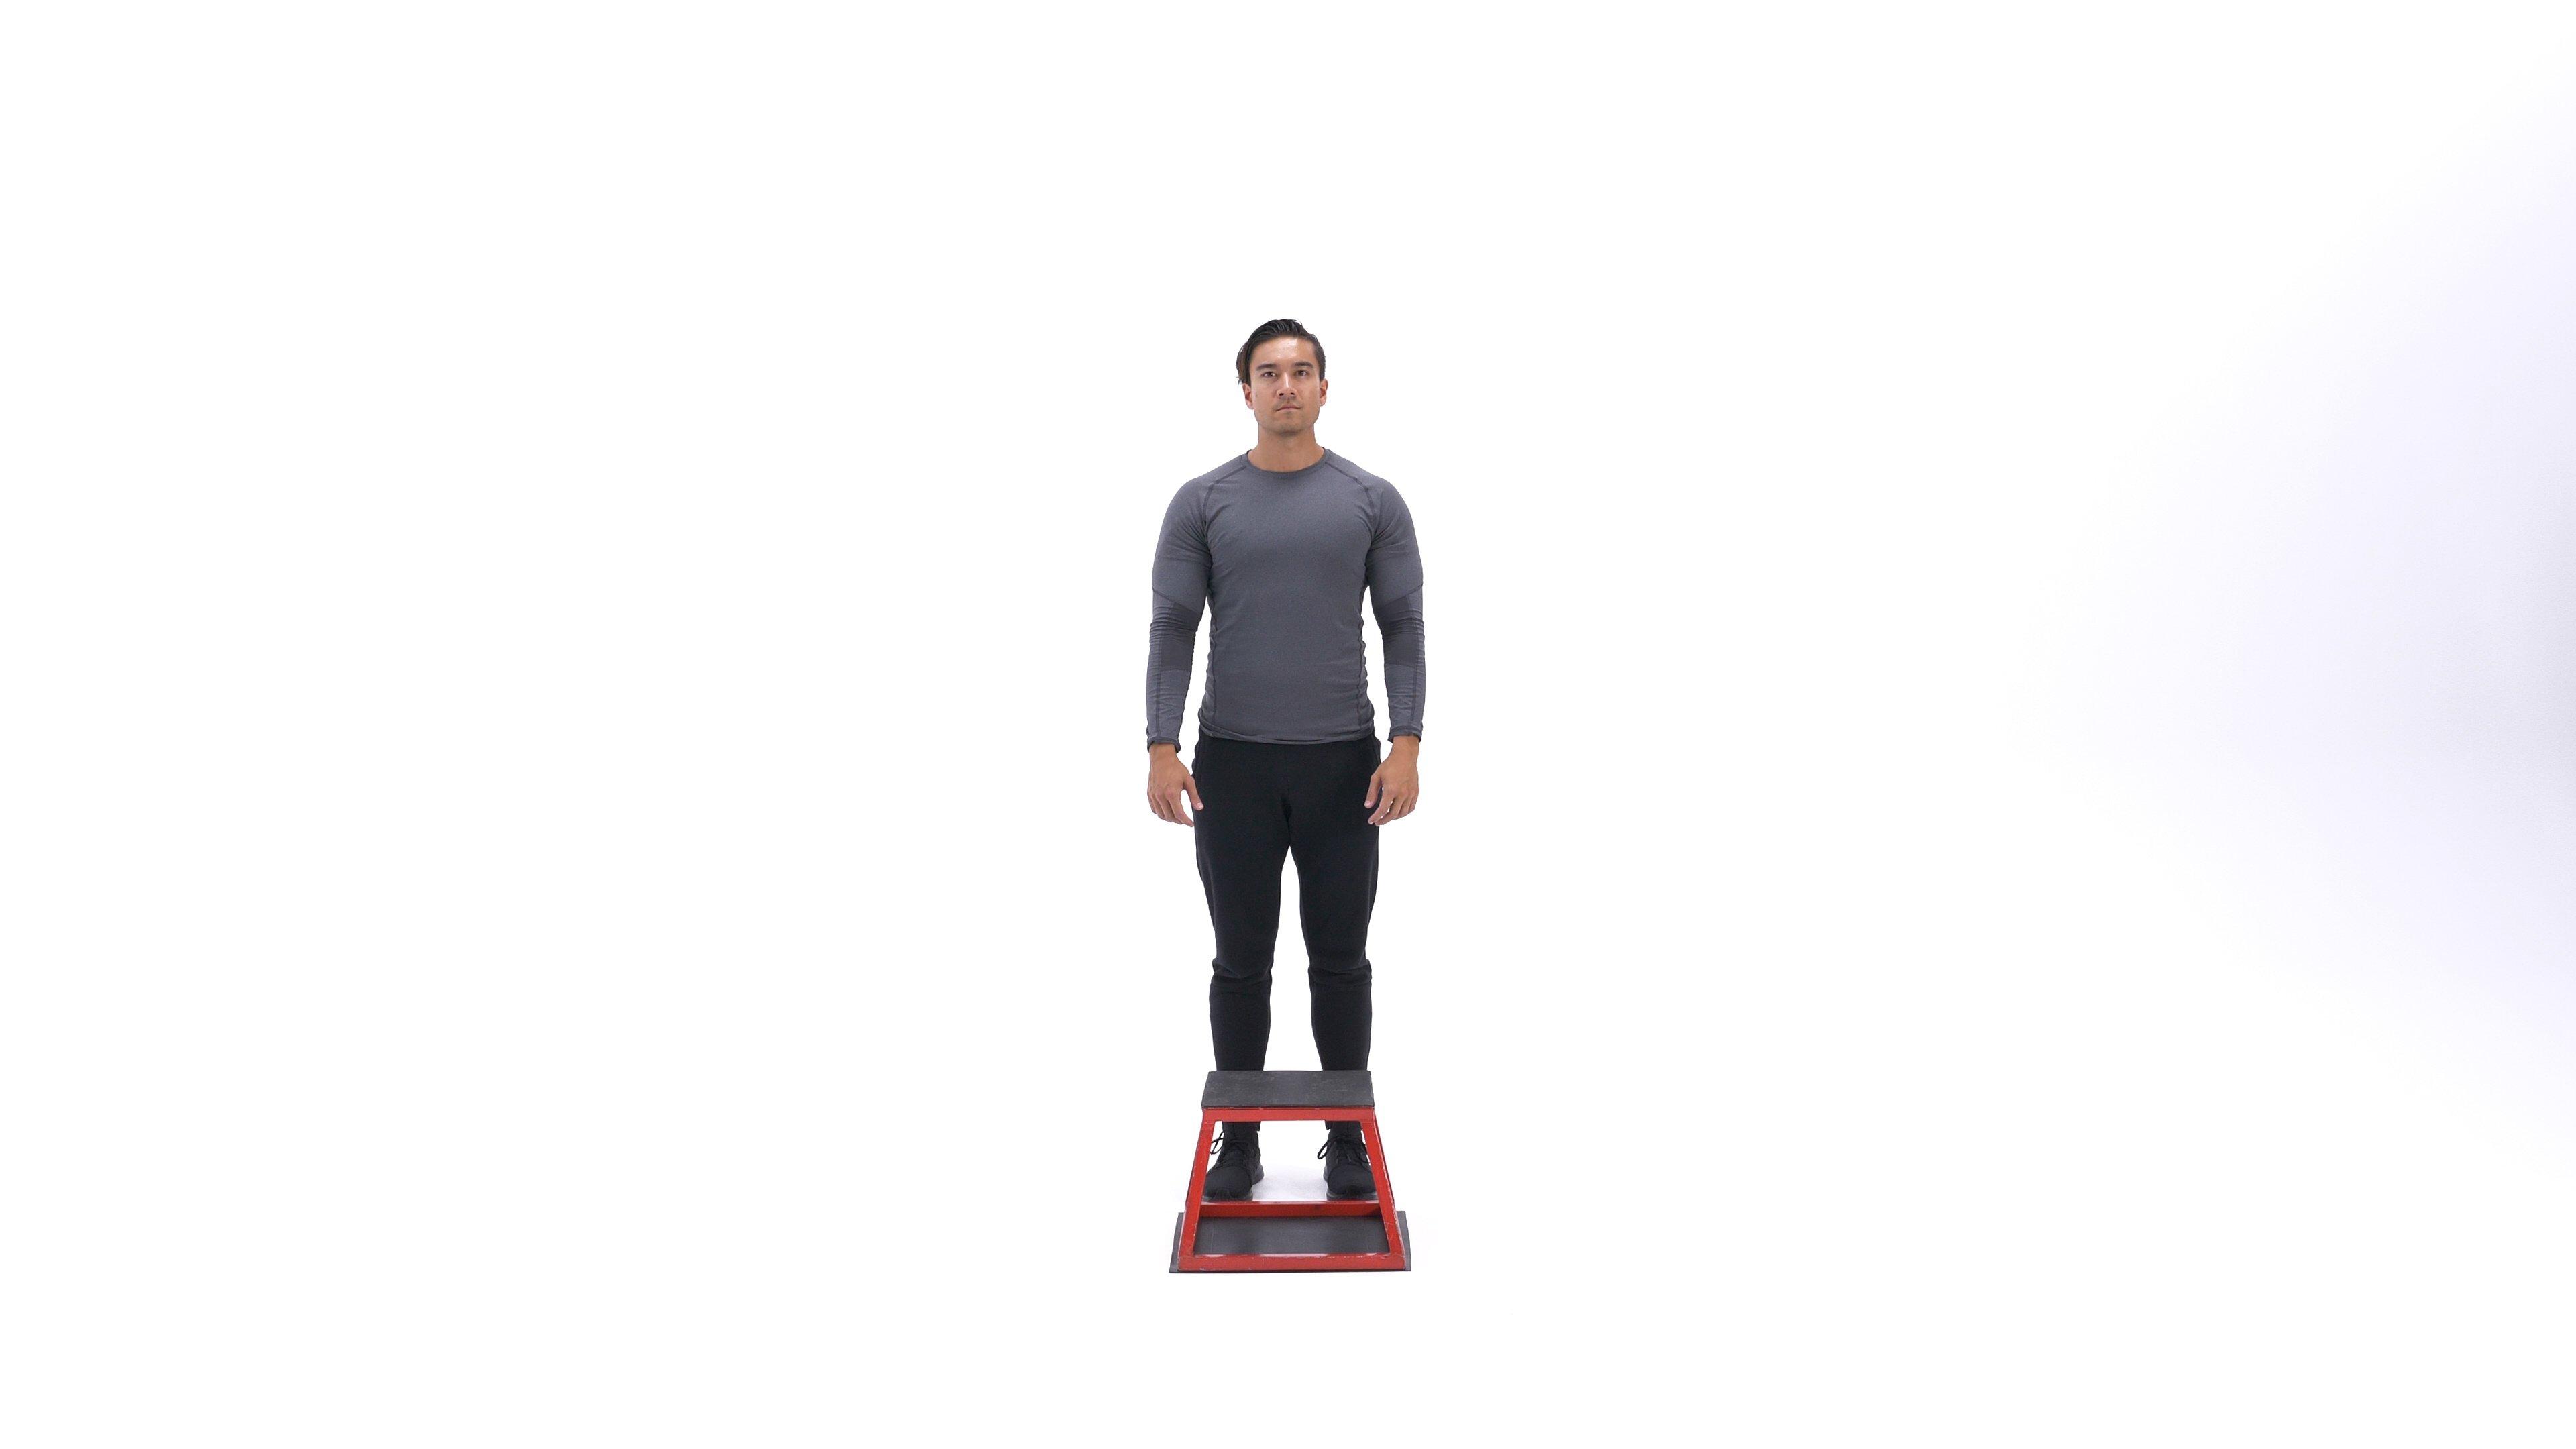 Single-leg depth squat image